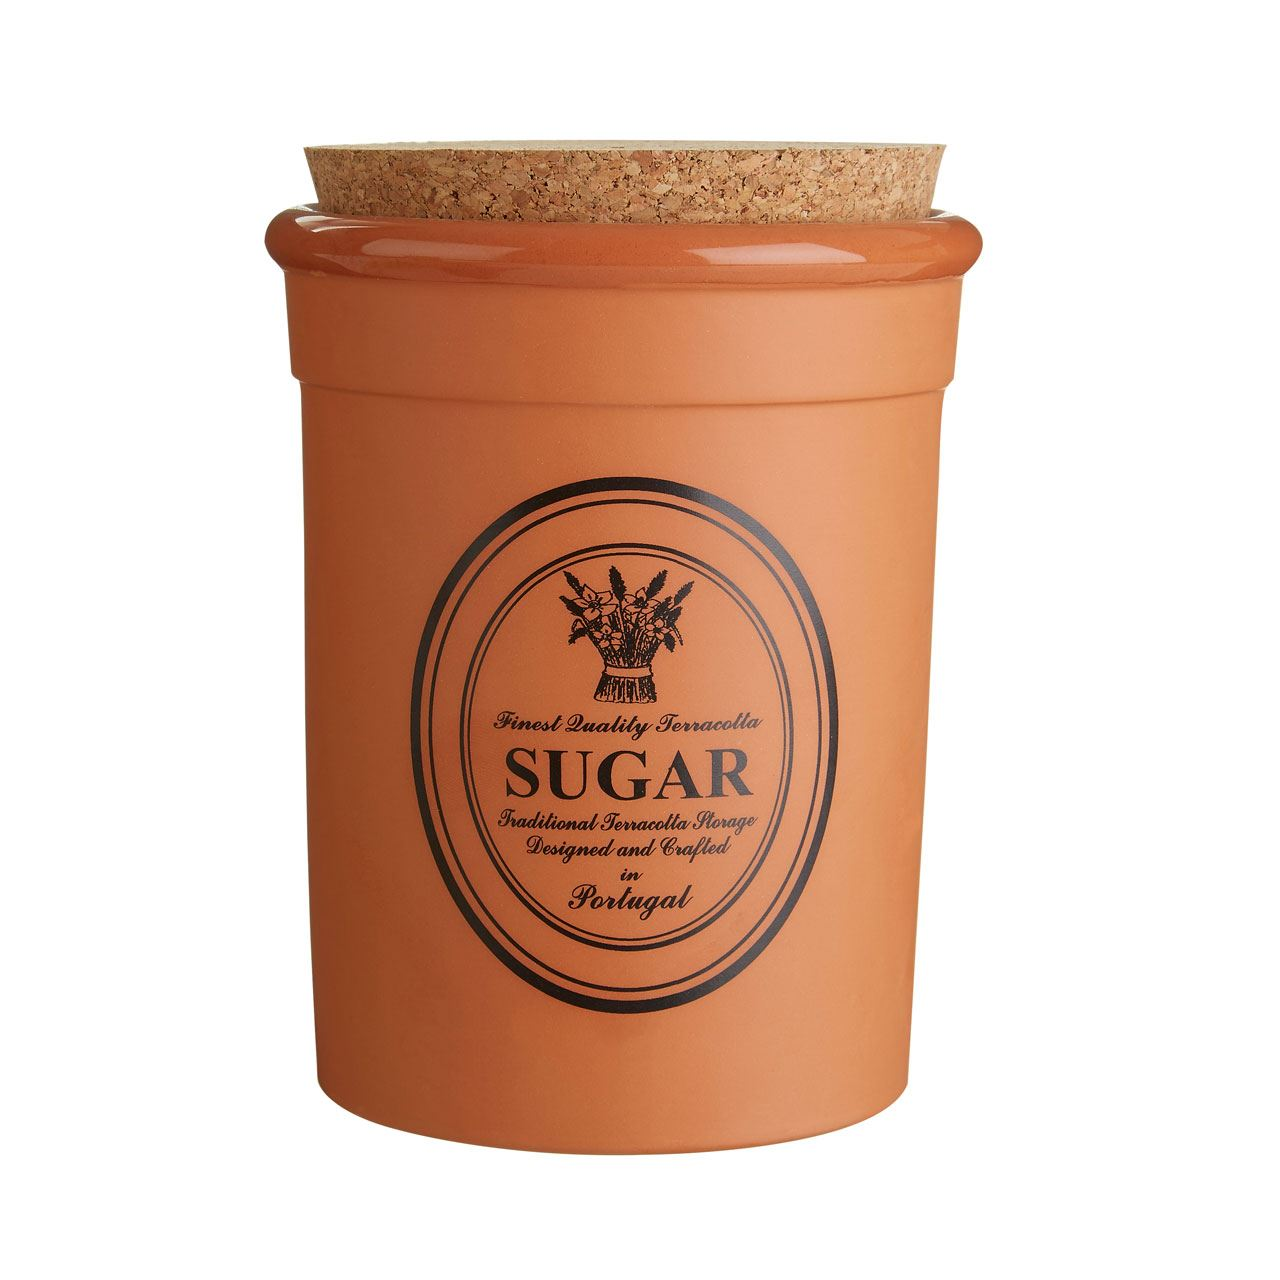 tea coffee sugar canisters pots kitchen storage jars. Black Bedroom Furniture Sets. Home Design Ideas